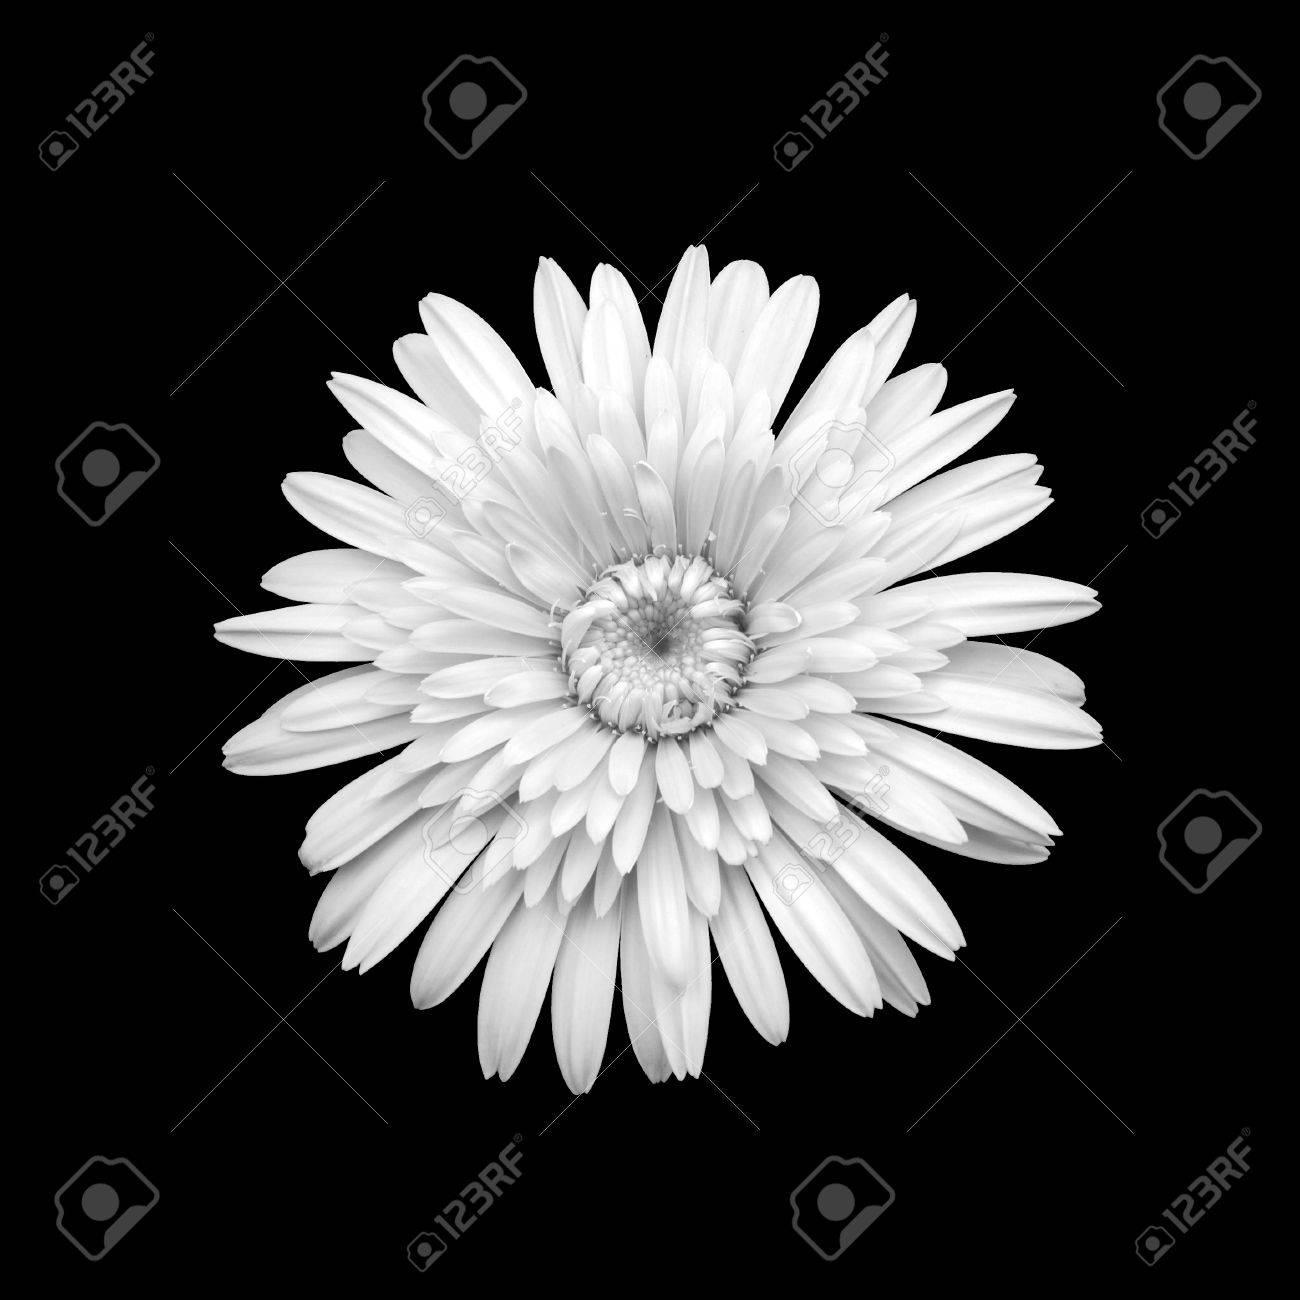 Black and white chrysanthemum flower stock photo picture and black and white chrysanthemum flower stock photo 35570278 mightylinksfo